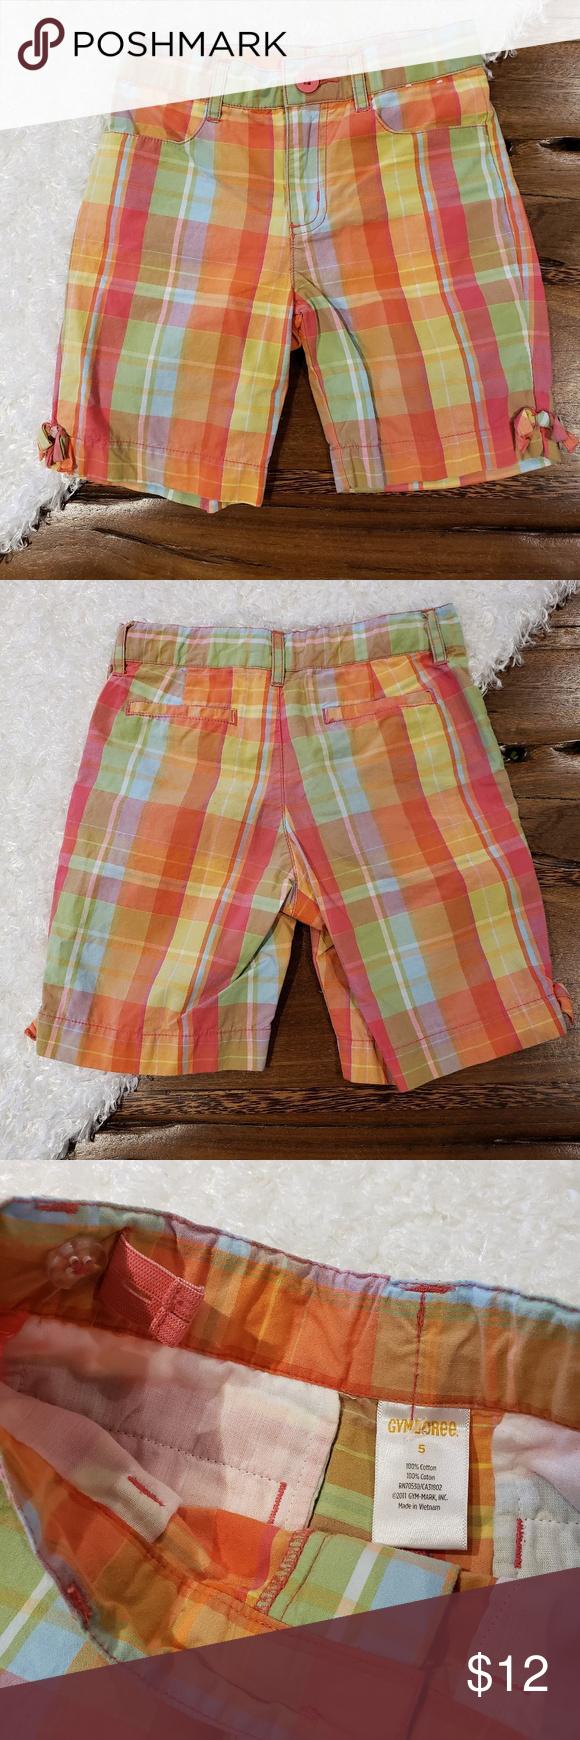 Gymboree Girls Little Bermuda Shorts